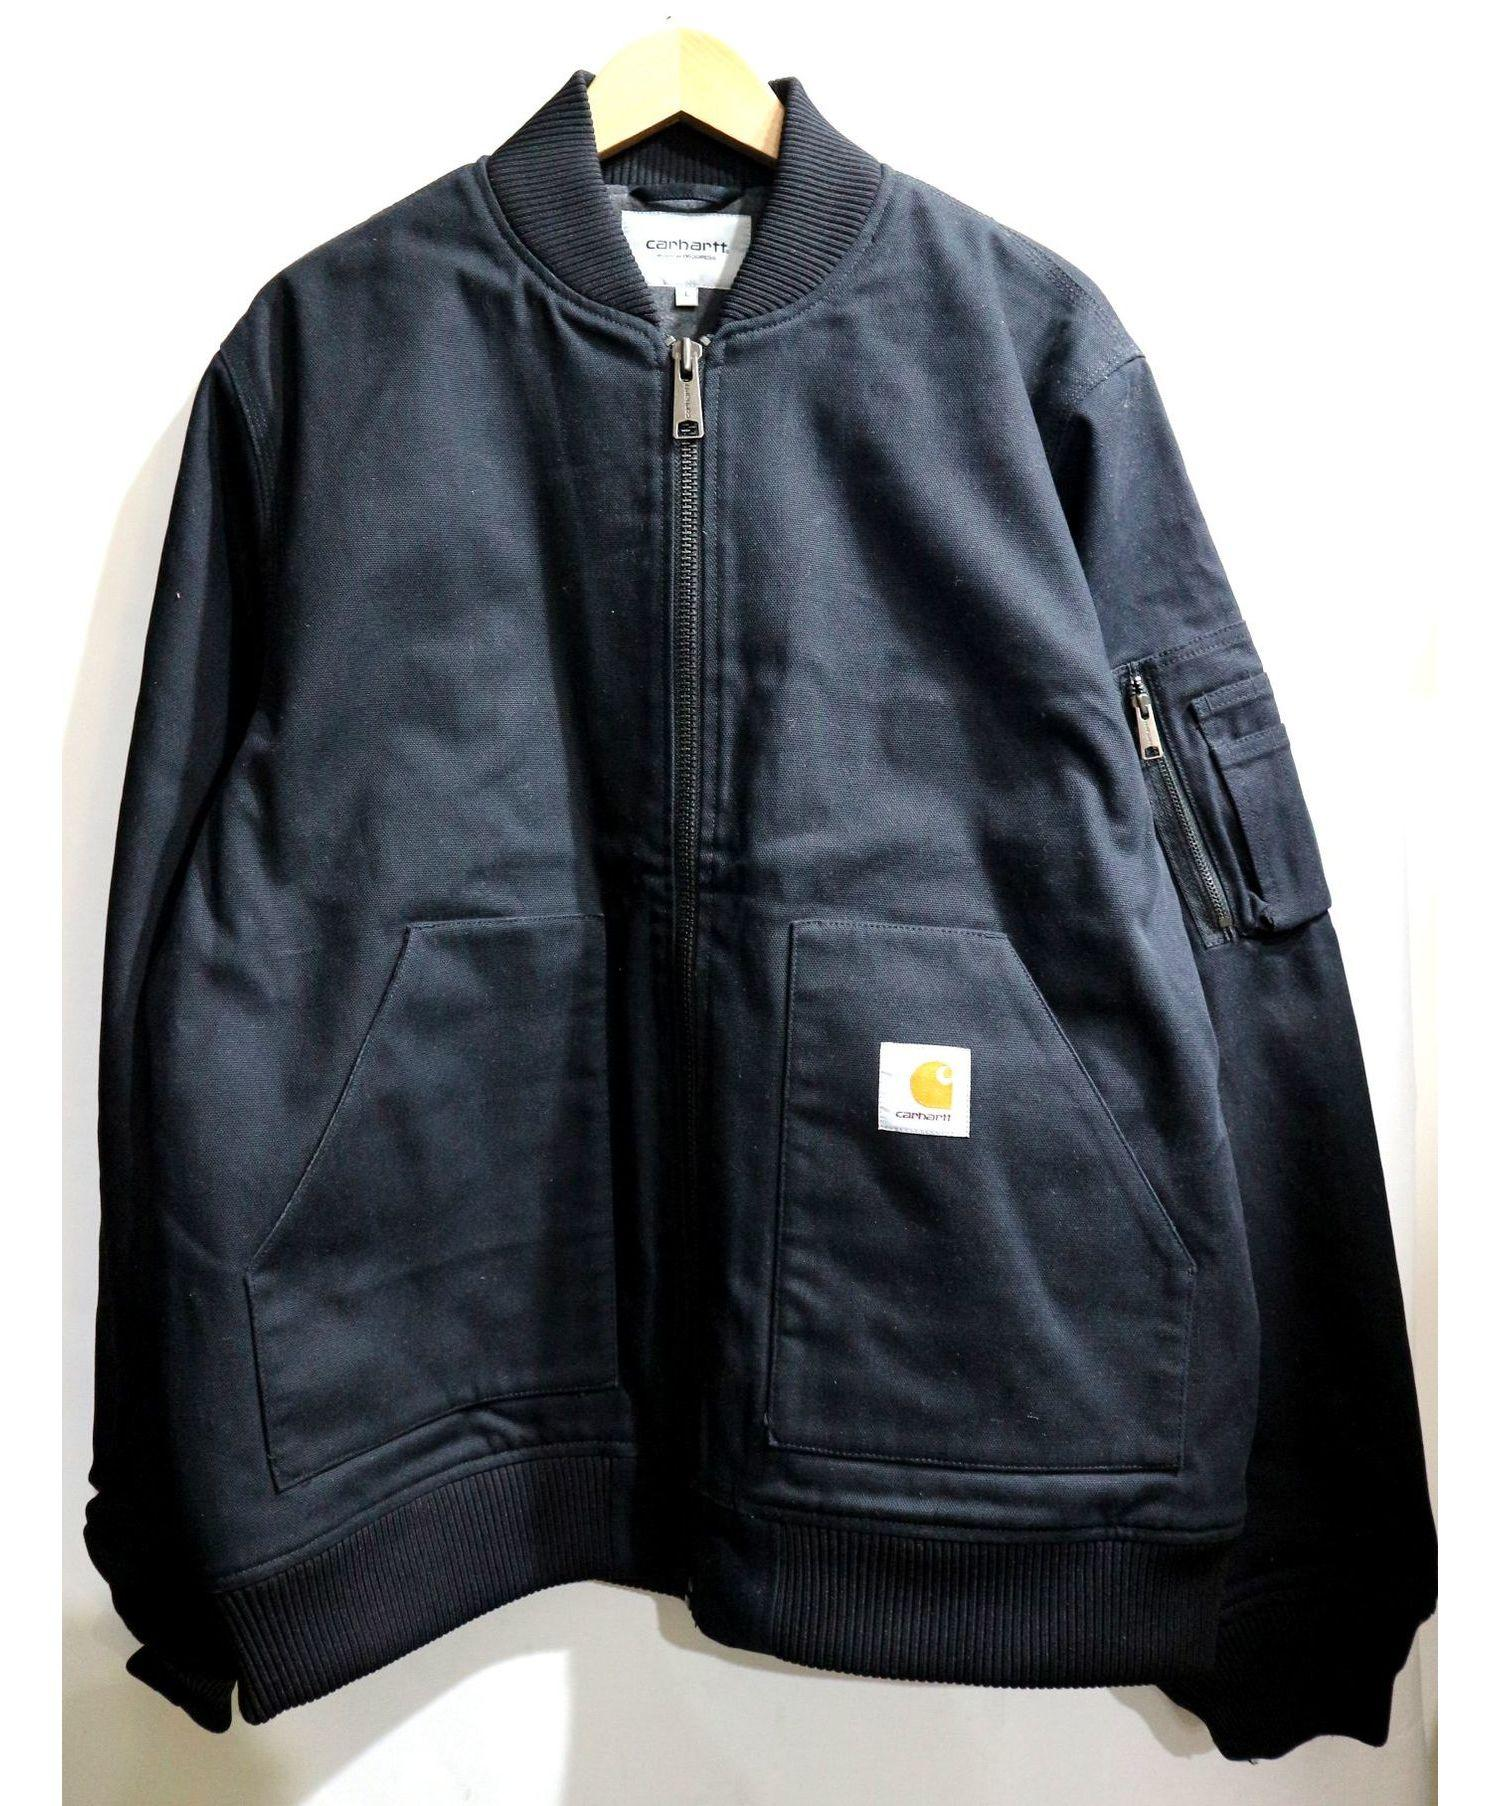 buy good get new new lower prices Carhartt WIP (カーハート ダブリューアイピー) INDUSTRIAL JACKET ブラック サイズ:L 定価¥38880